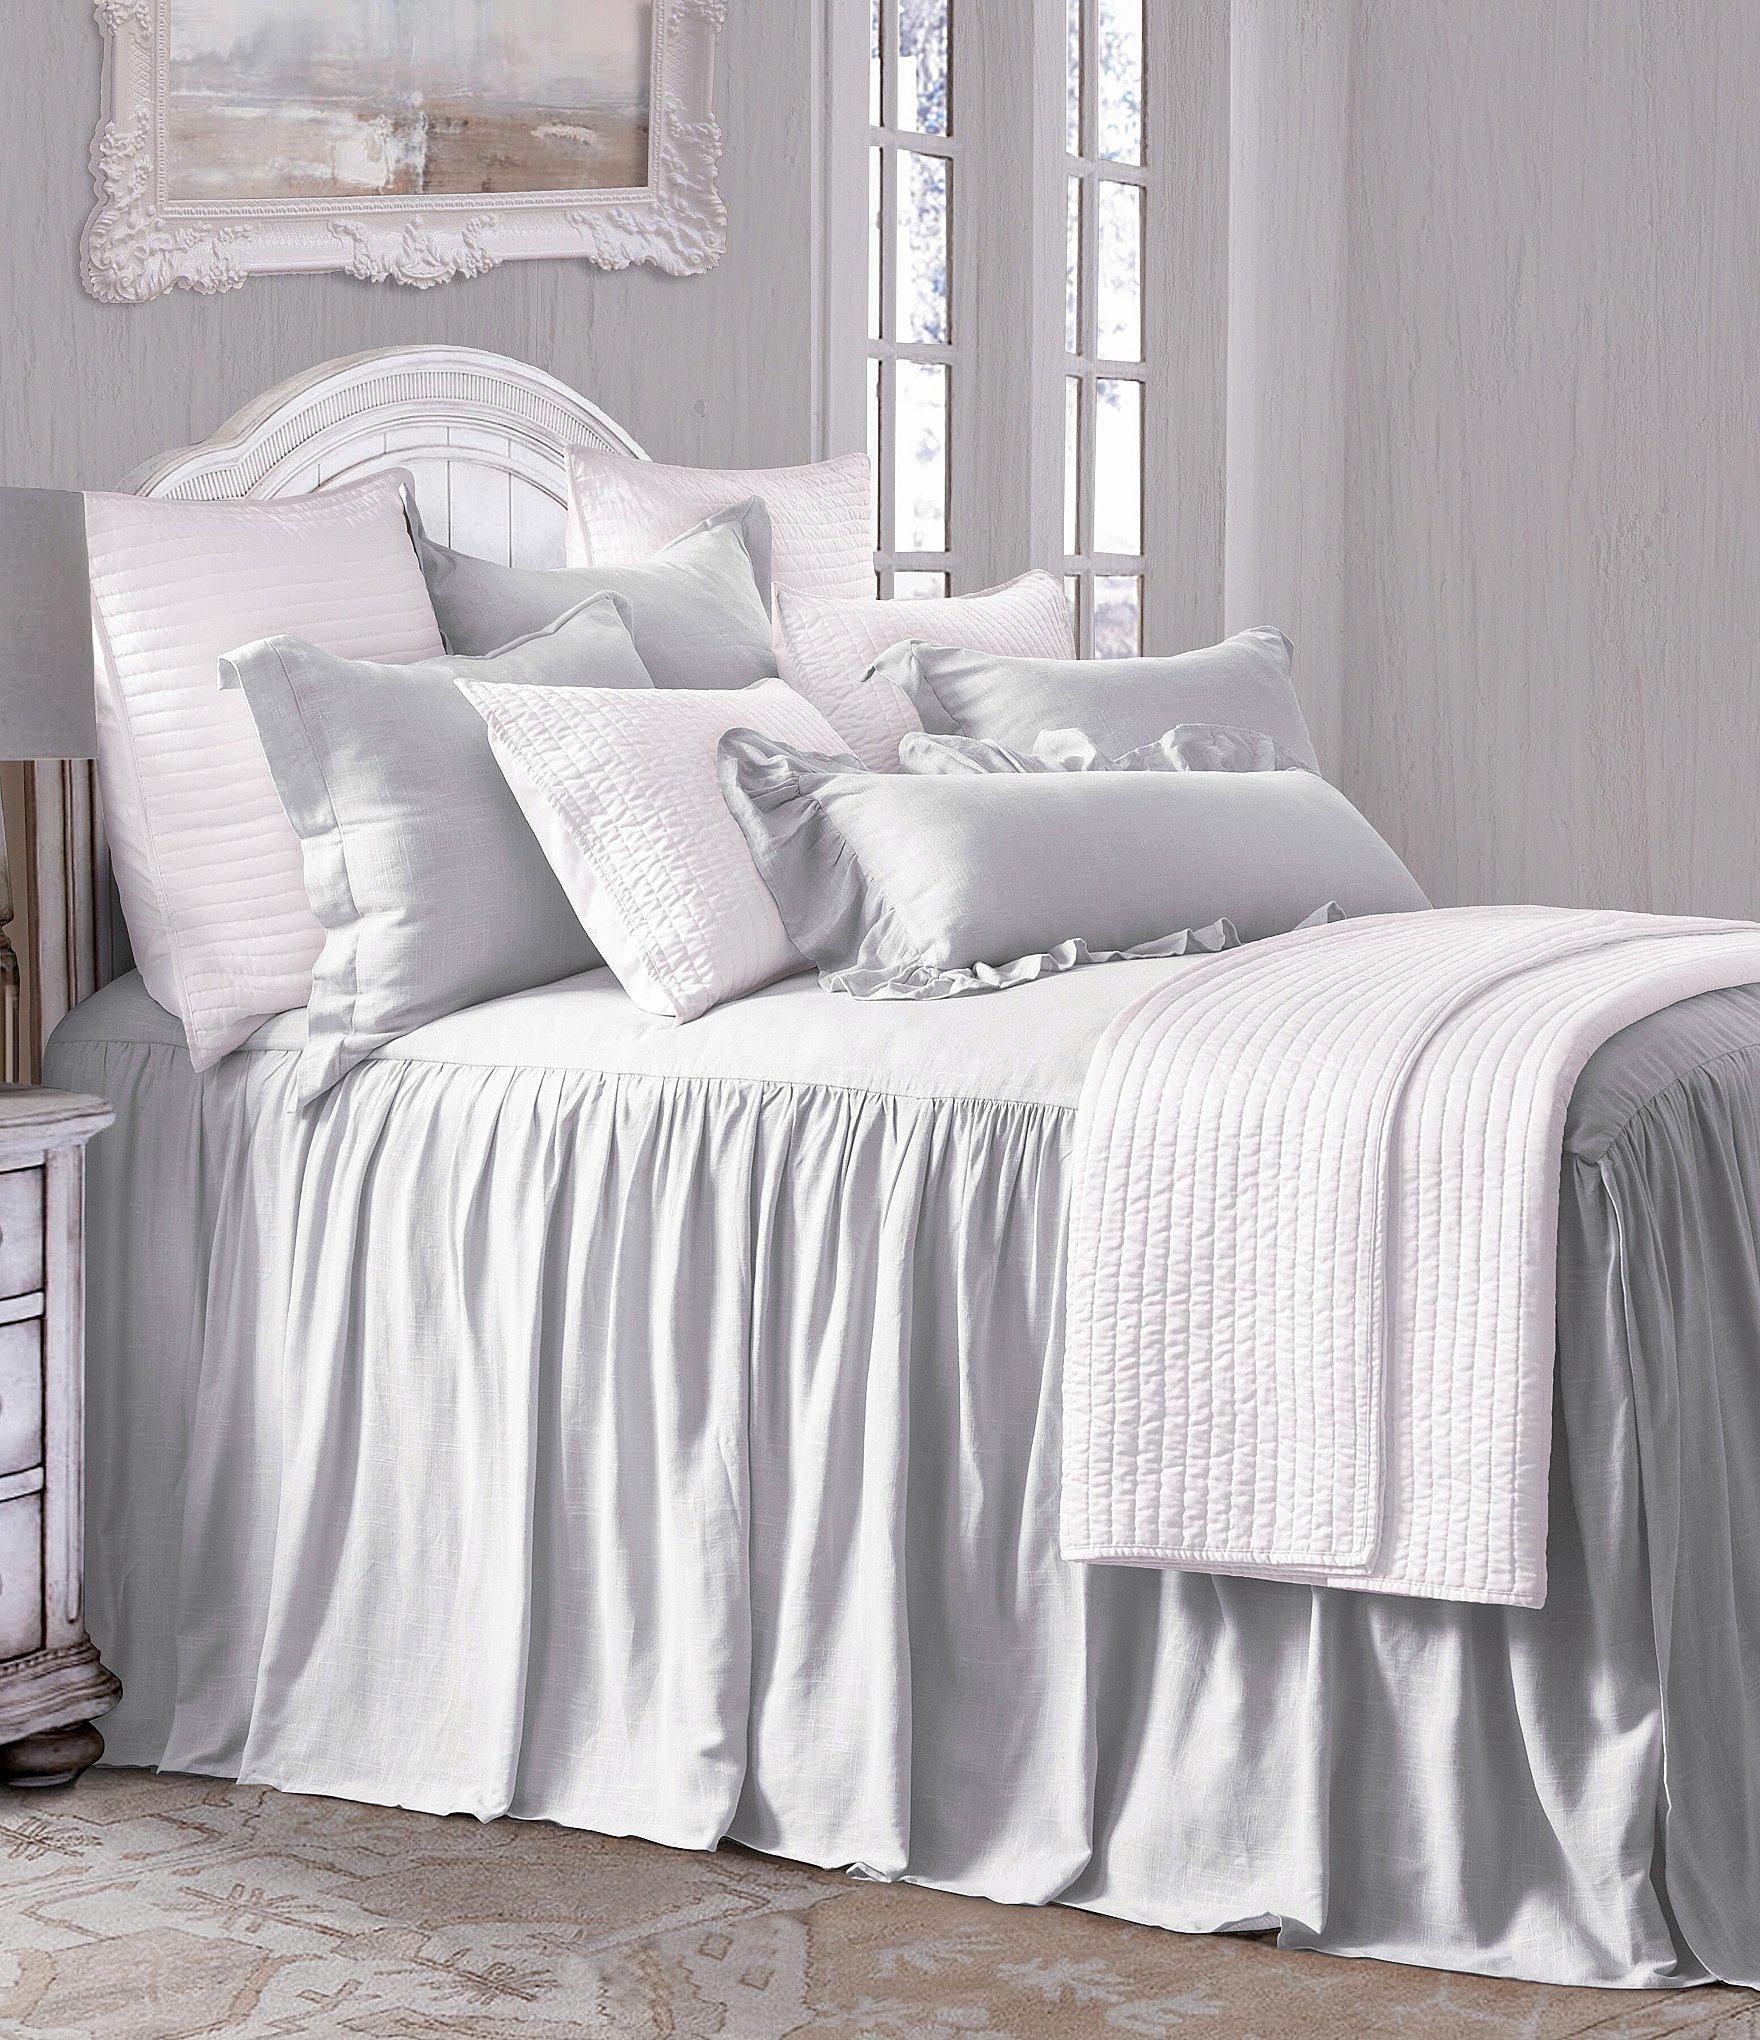 Bedspreads.Hiend Accents Luna Bedspread Mini Set